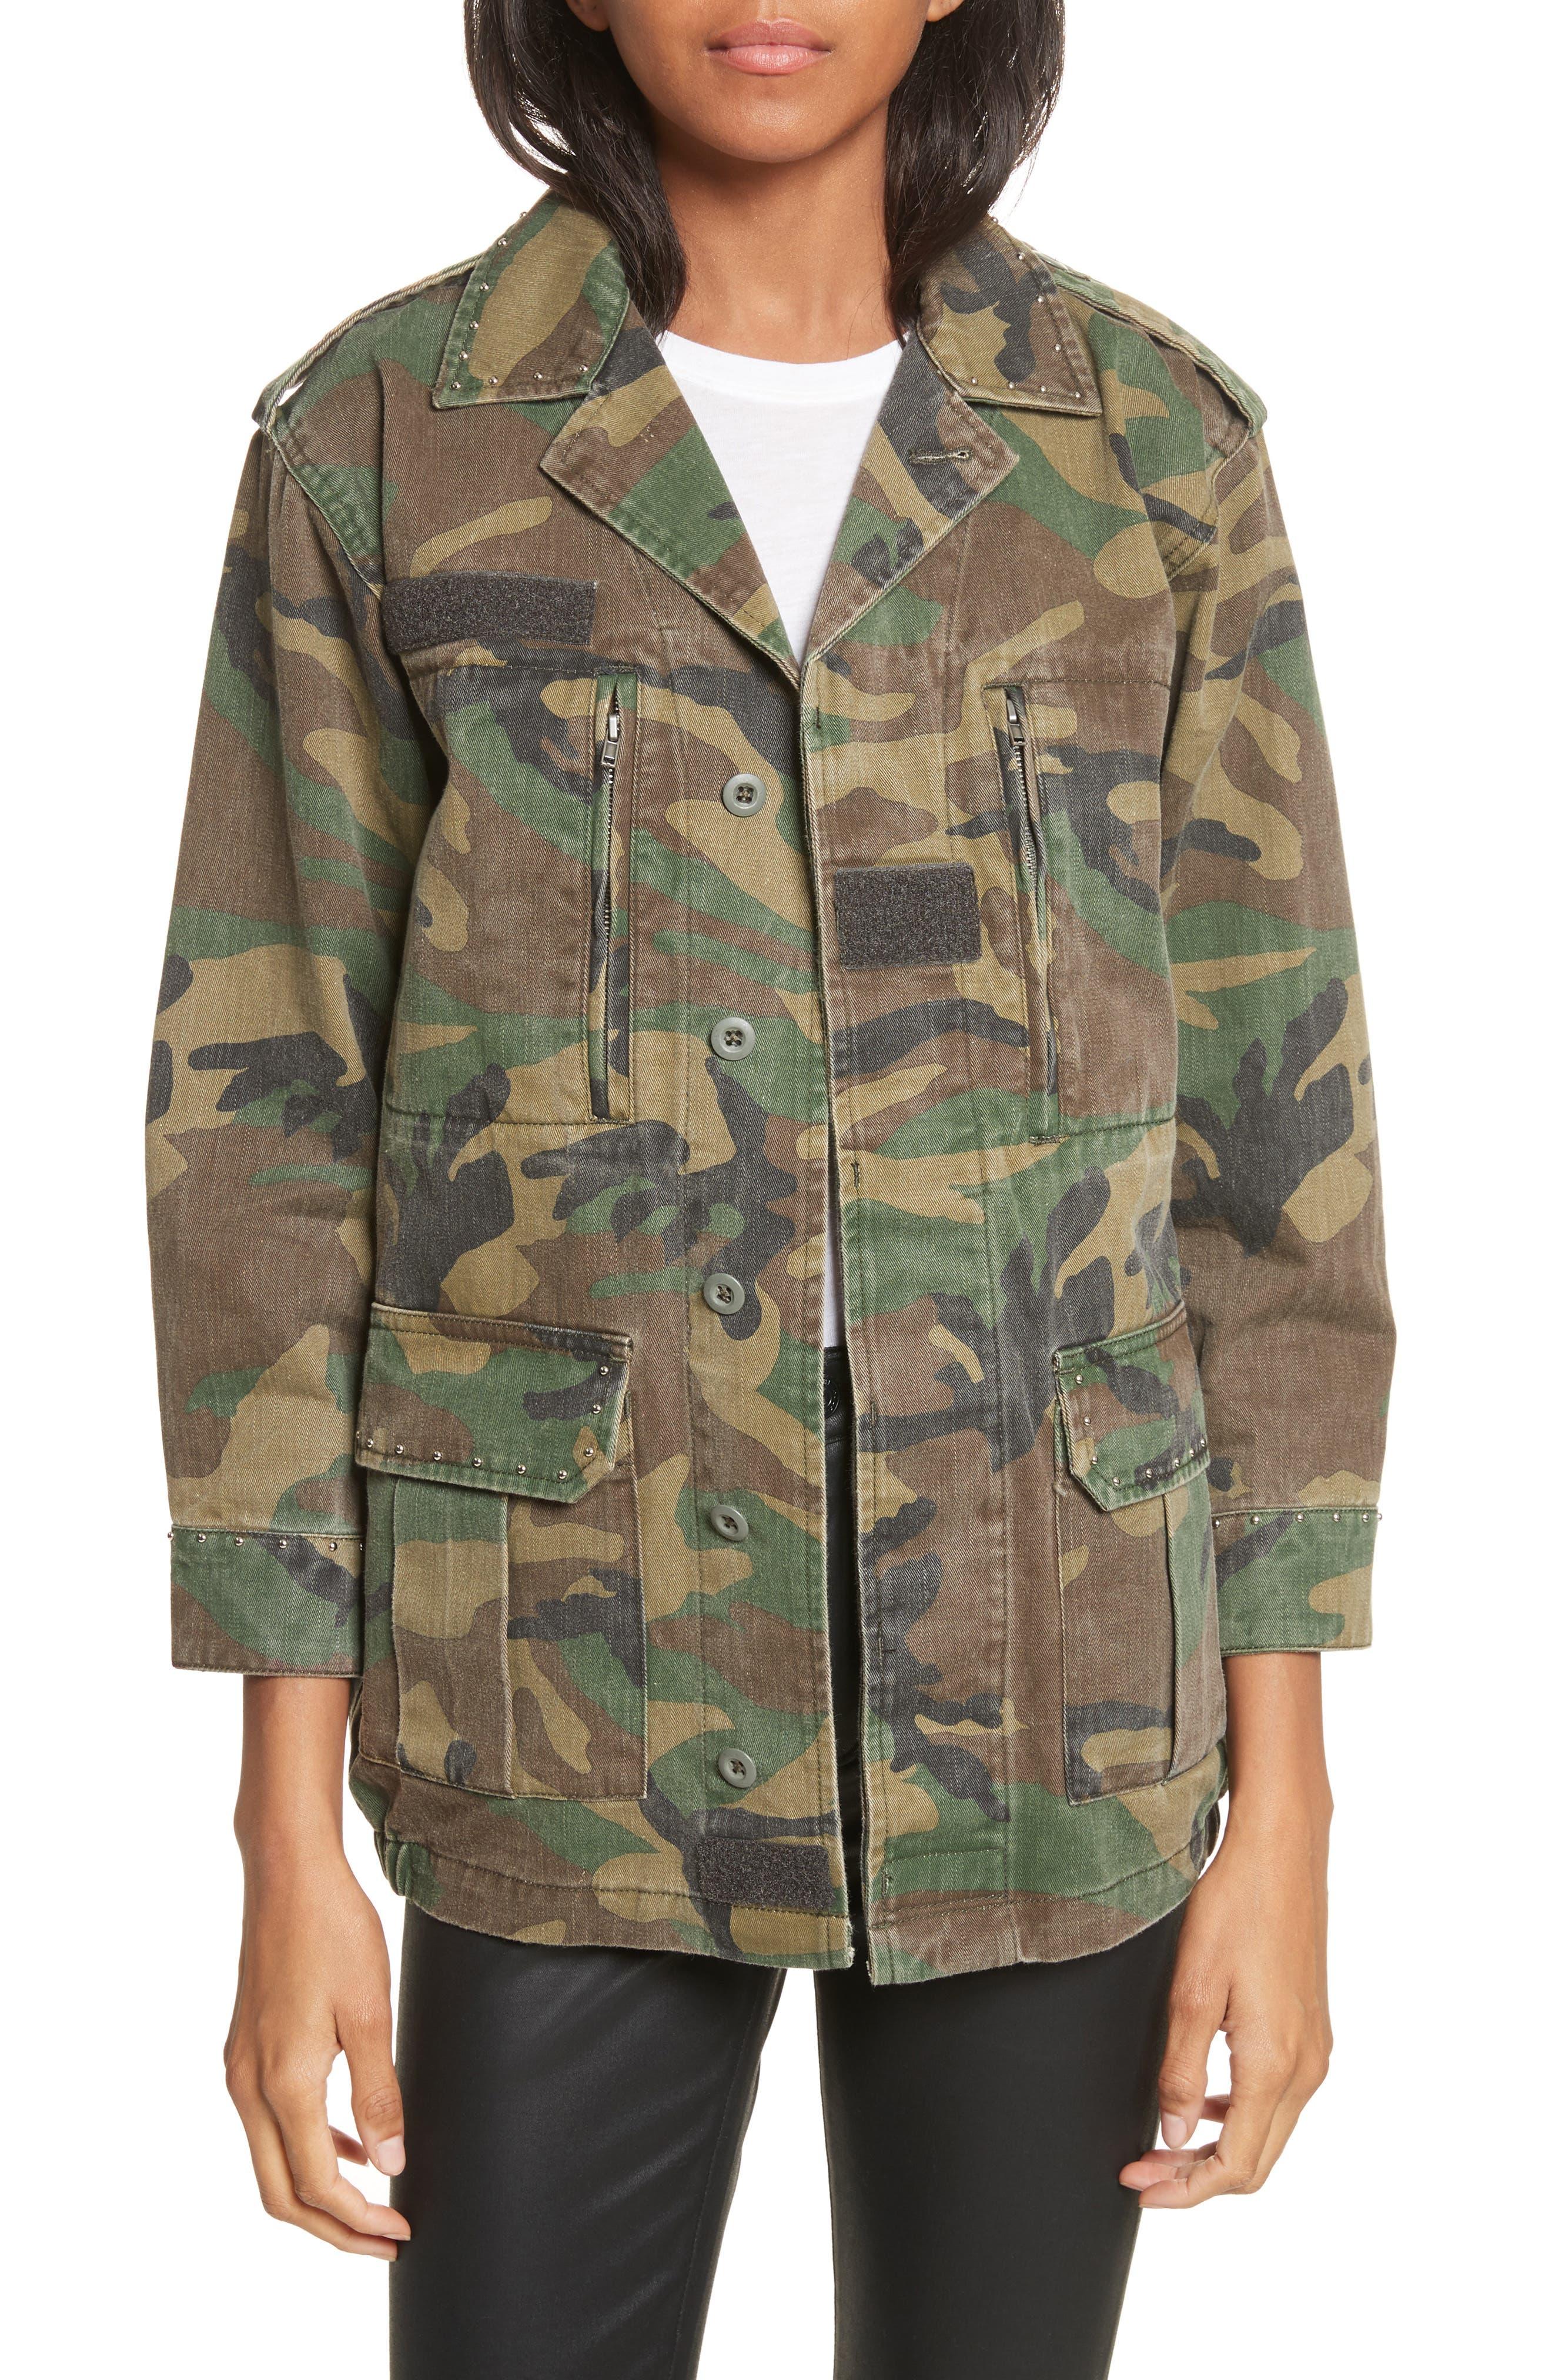 The Kooples Studded Camouflage Jacket